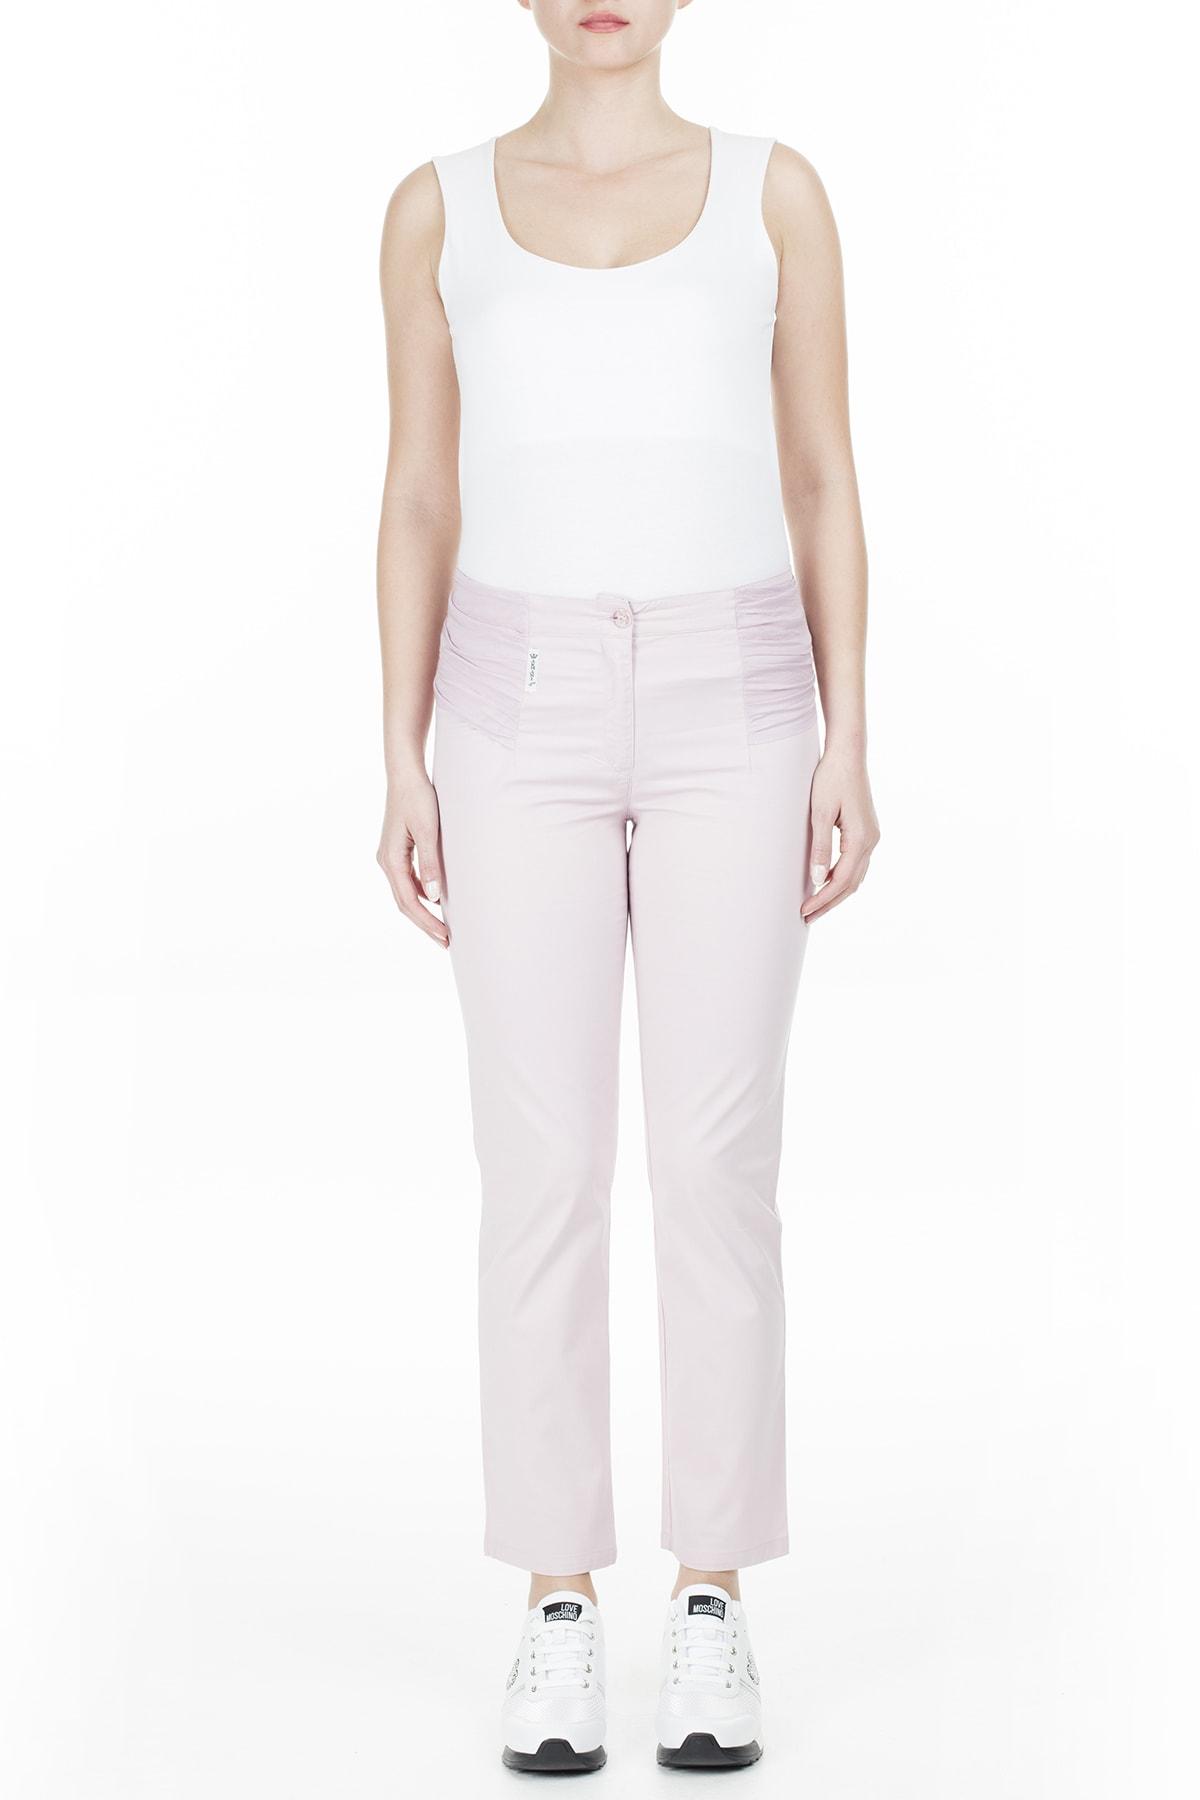 Armani Jeans Kadın Pembe Pantolon Zoxbsp10Pl 1